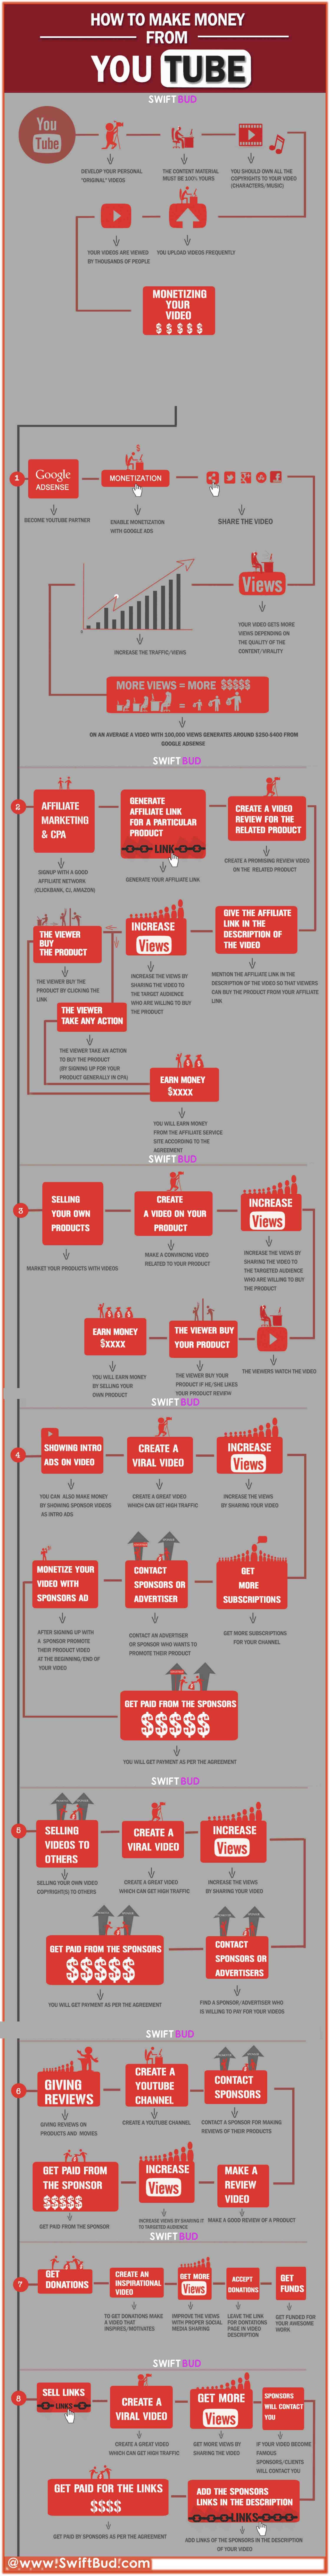 how to make money using google